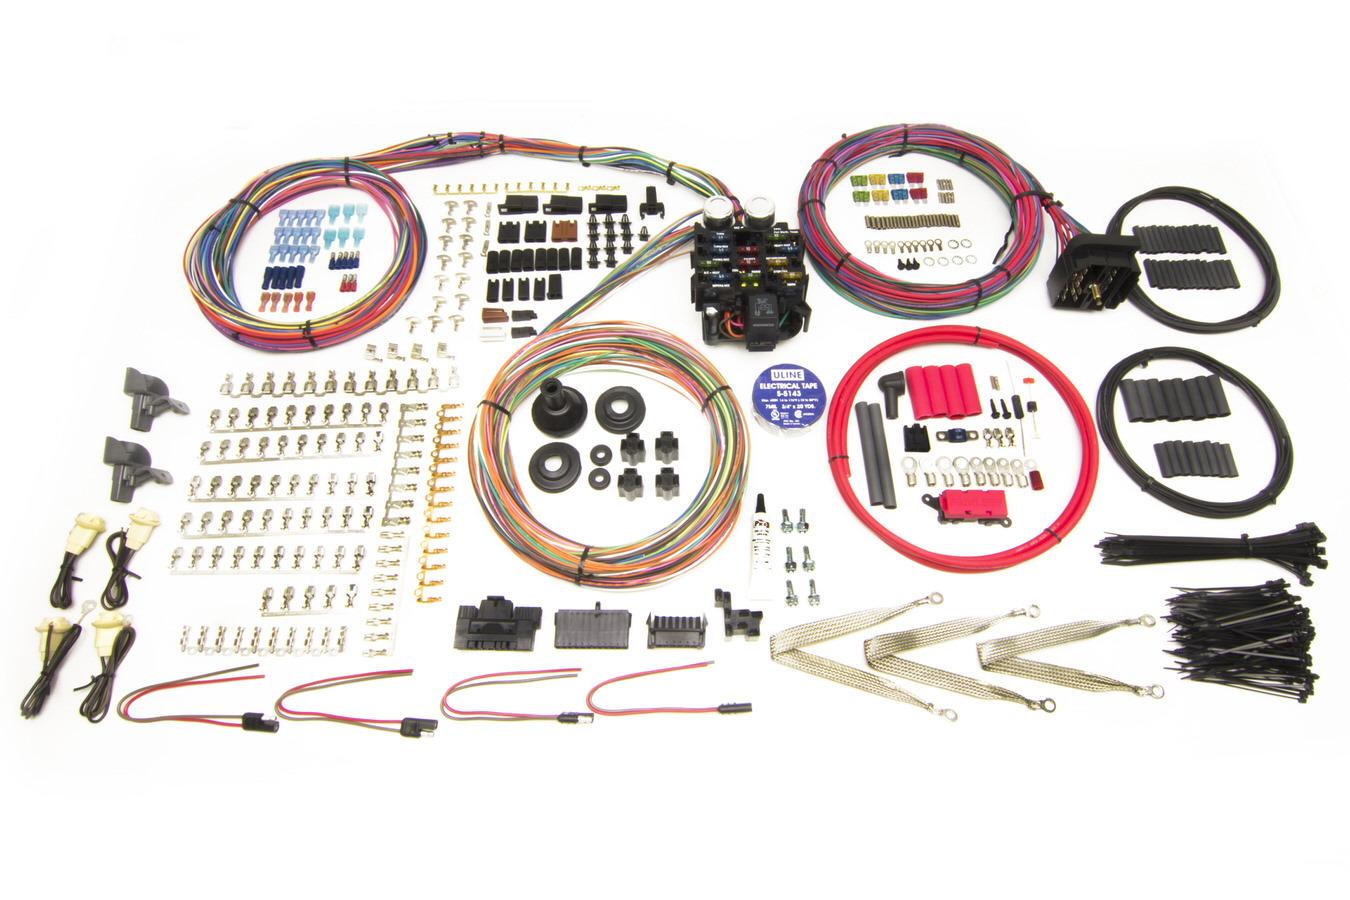 Painless Wiring 23 Circuit Harness - Pro Series Key In Dash